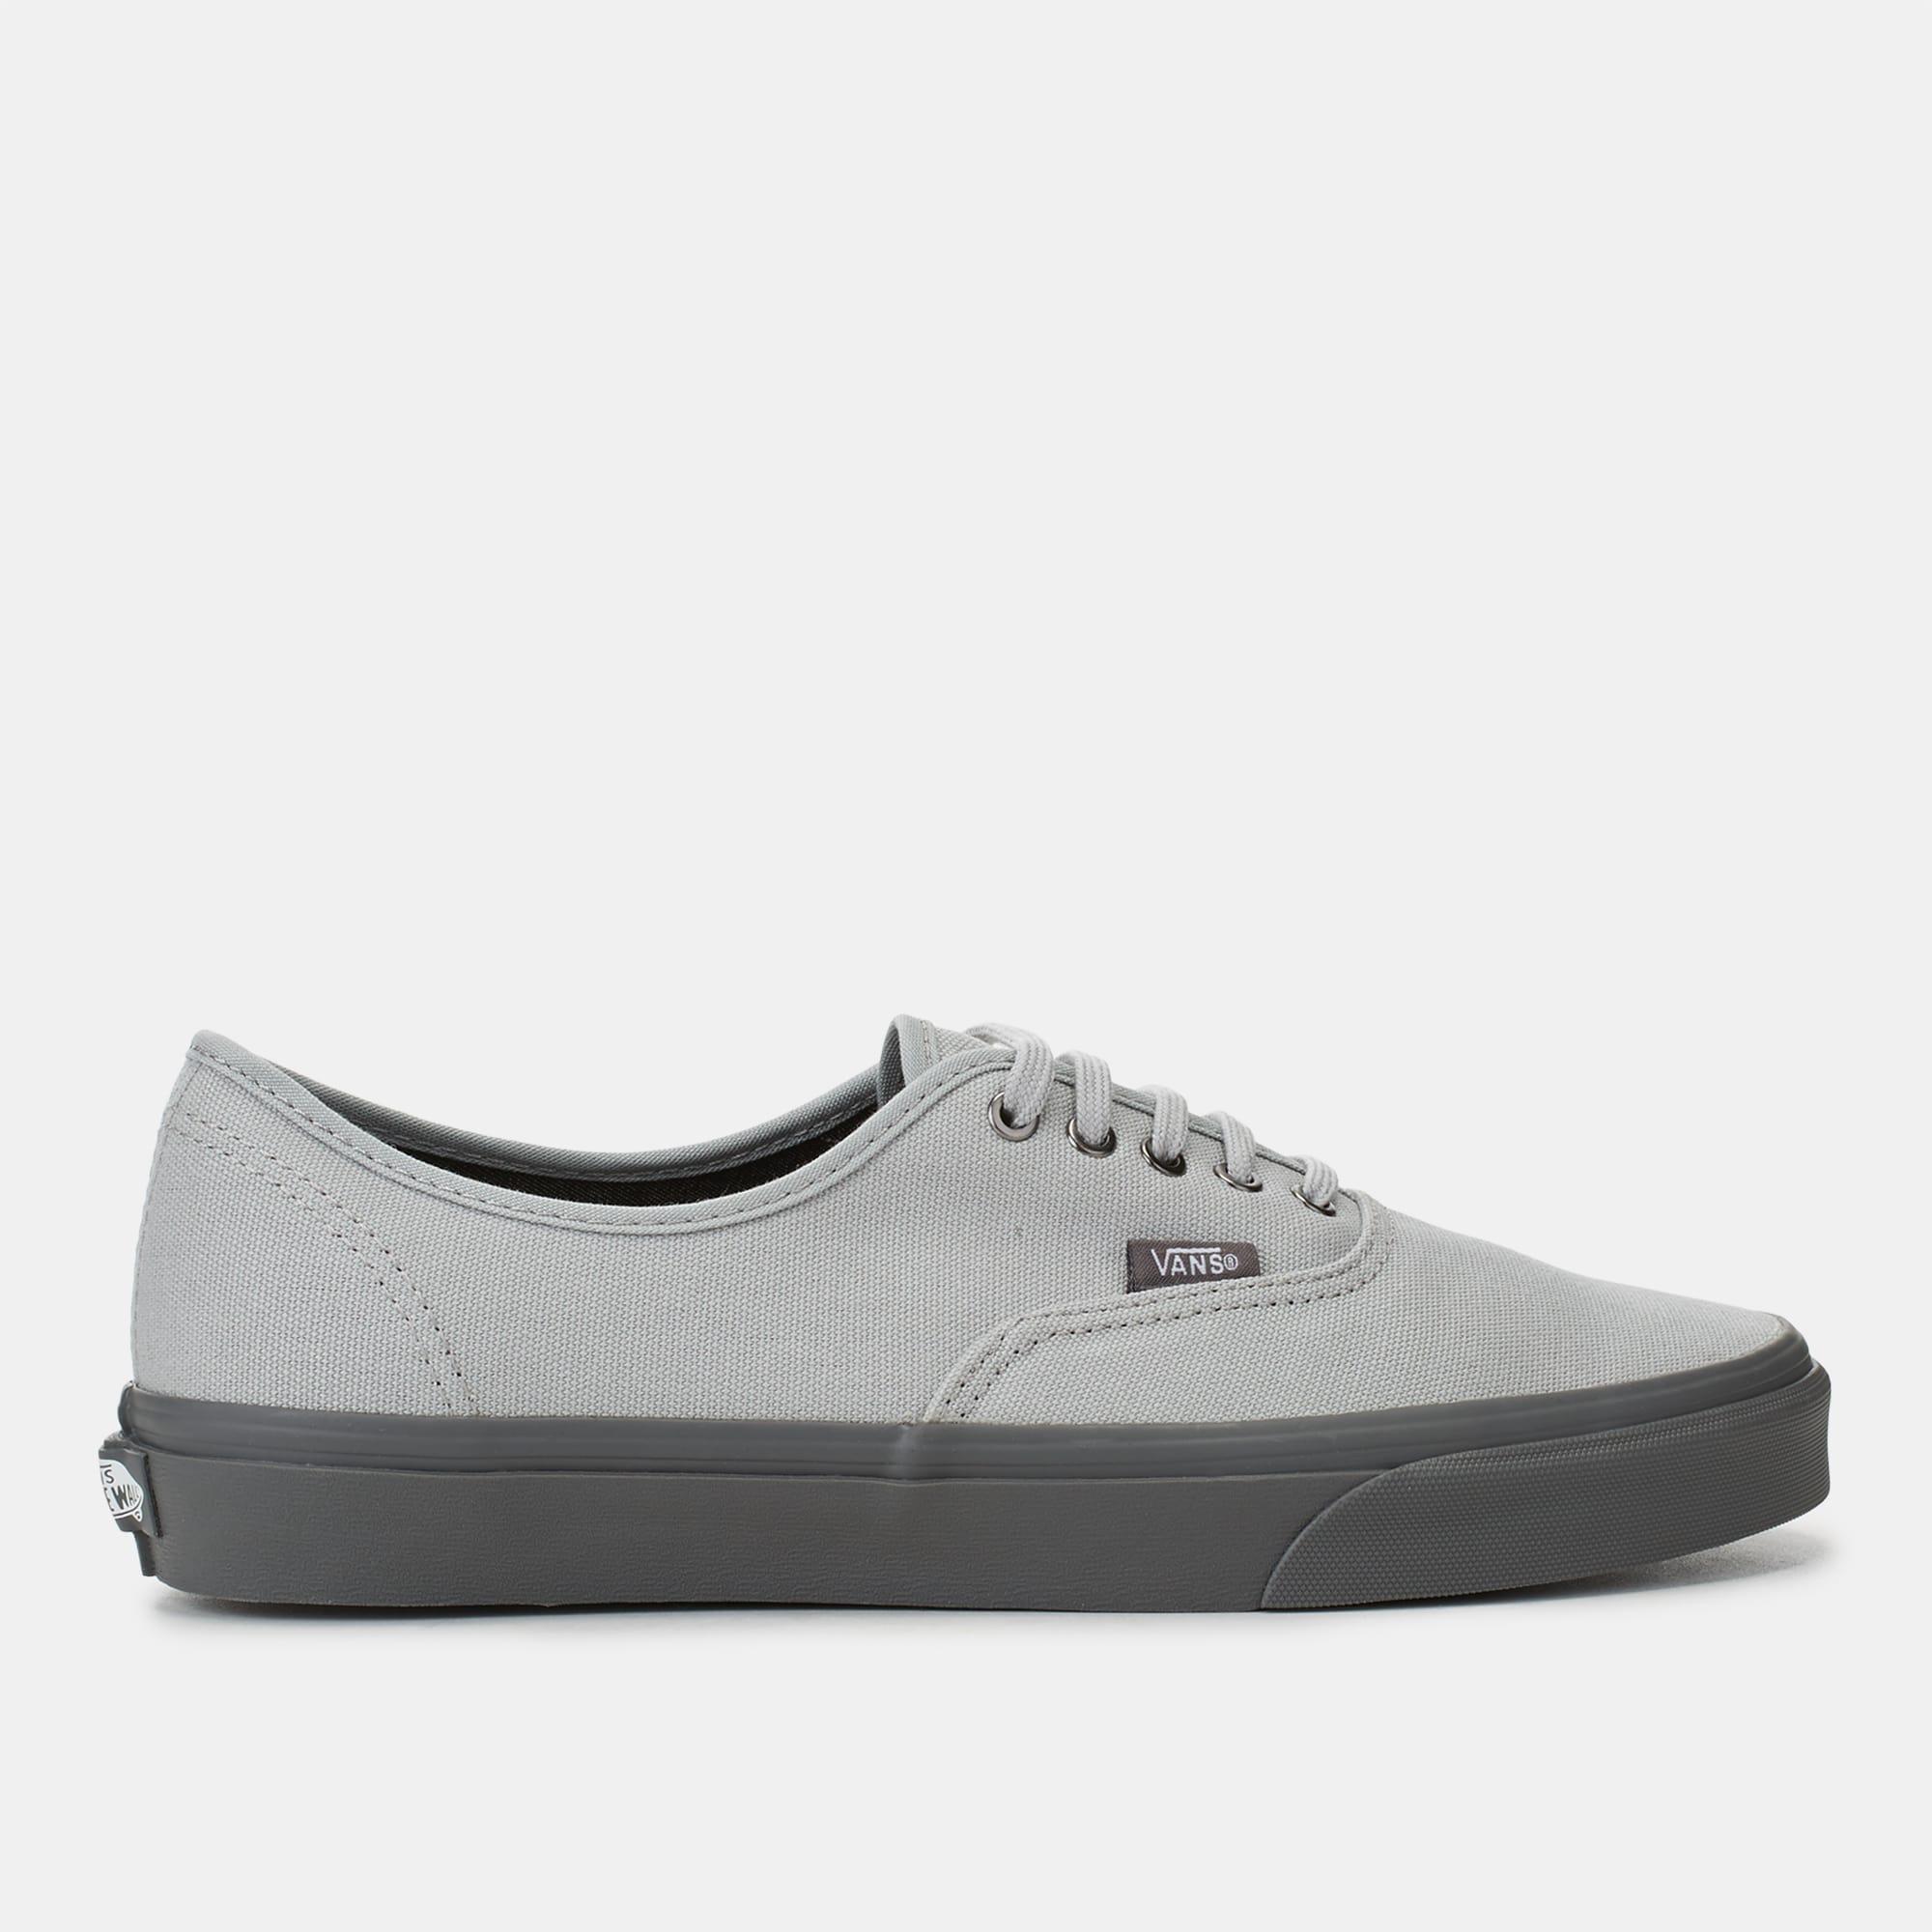 Zapatillas Nike Cary 5 para hombre CouponSahl coupon sahl